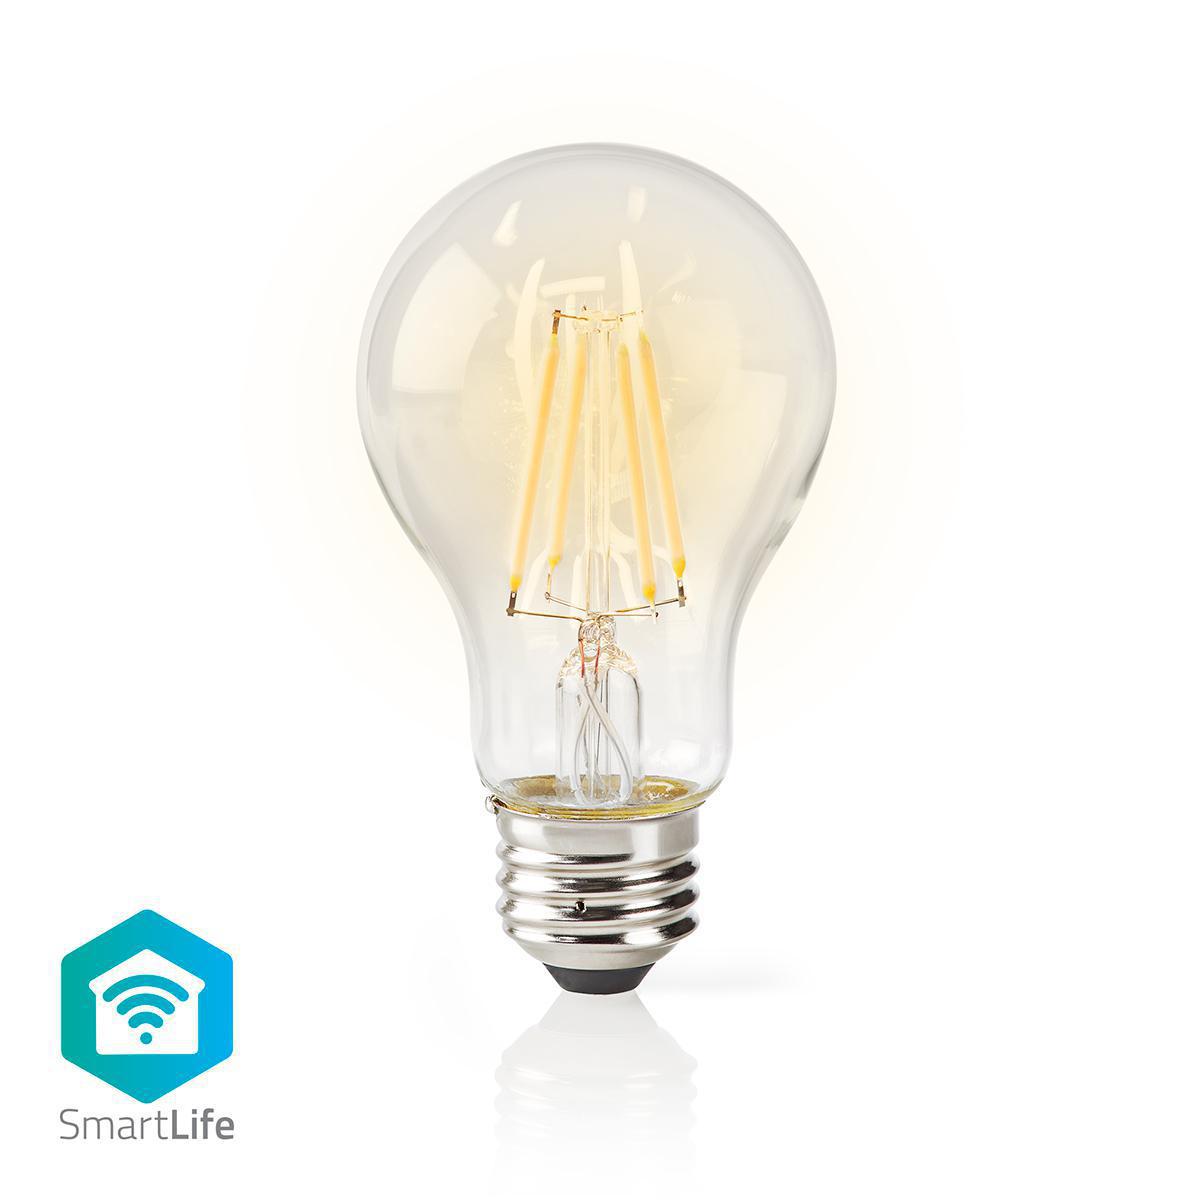 Slimme Wi-Fi Led Lamp helder glas 5 Watt 2700K warm wit - vooraanzicht lamp aan